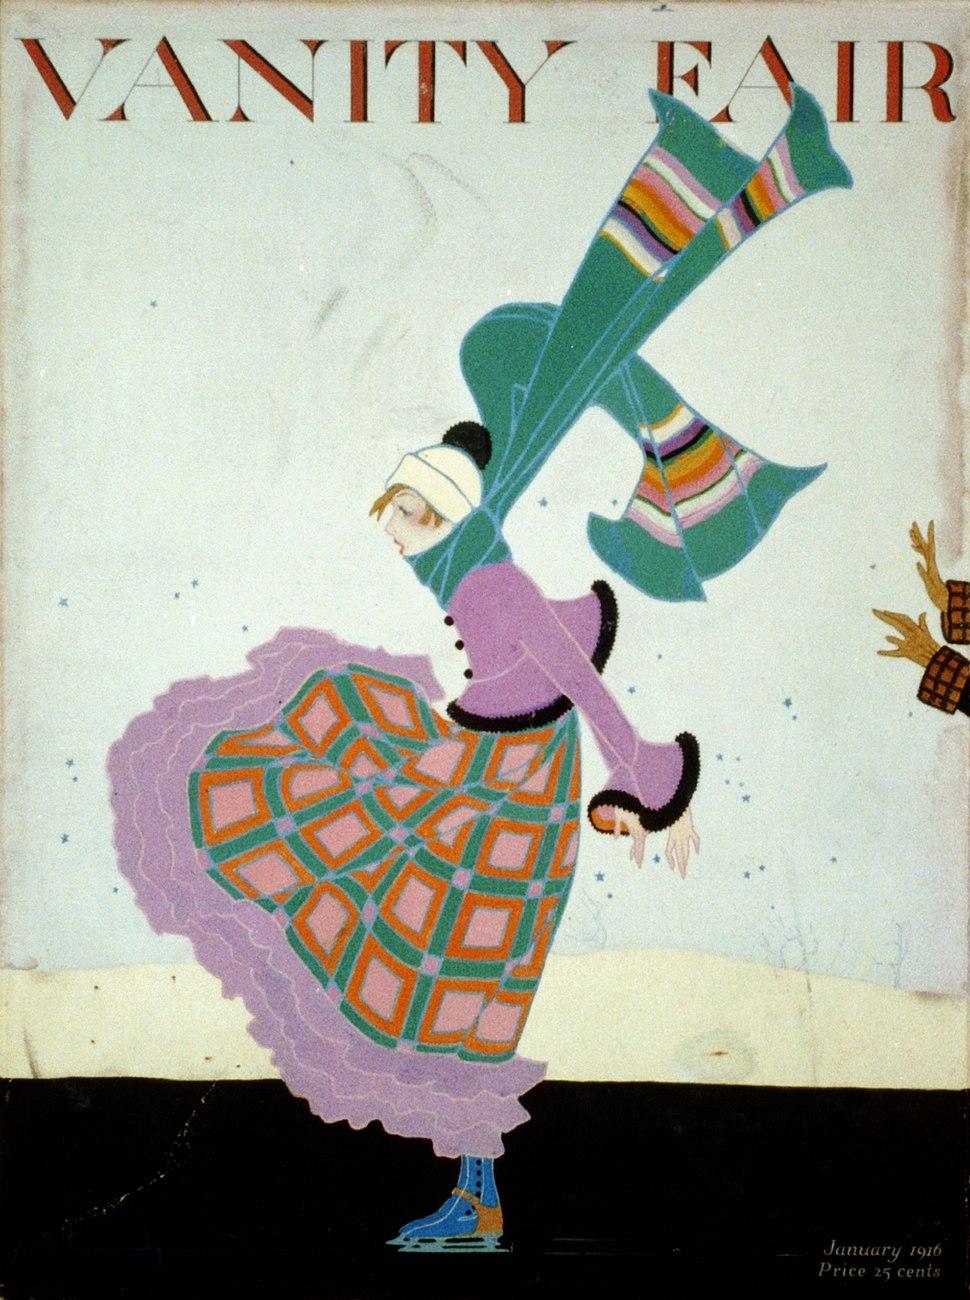 Vanity Fair cover by Ethel Caroline Rundquist 1916